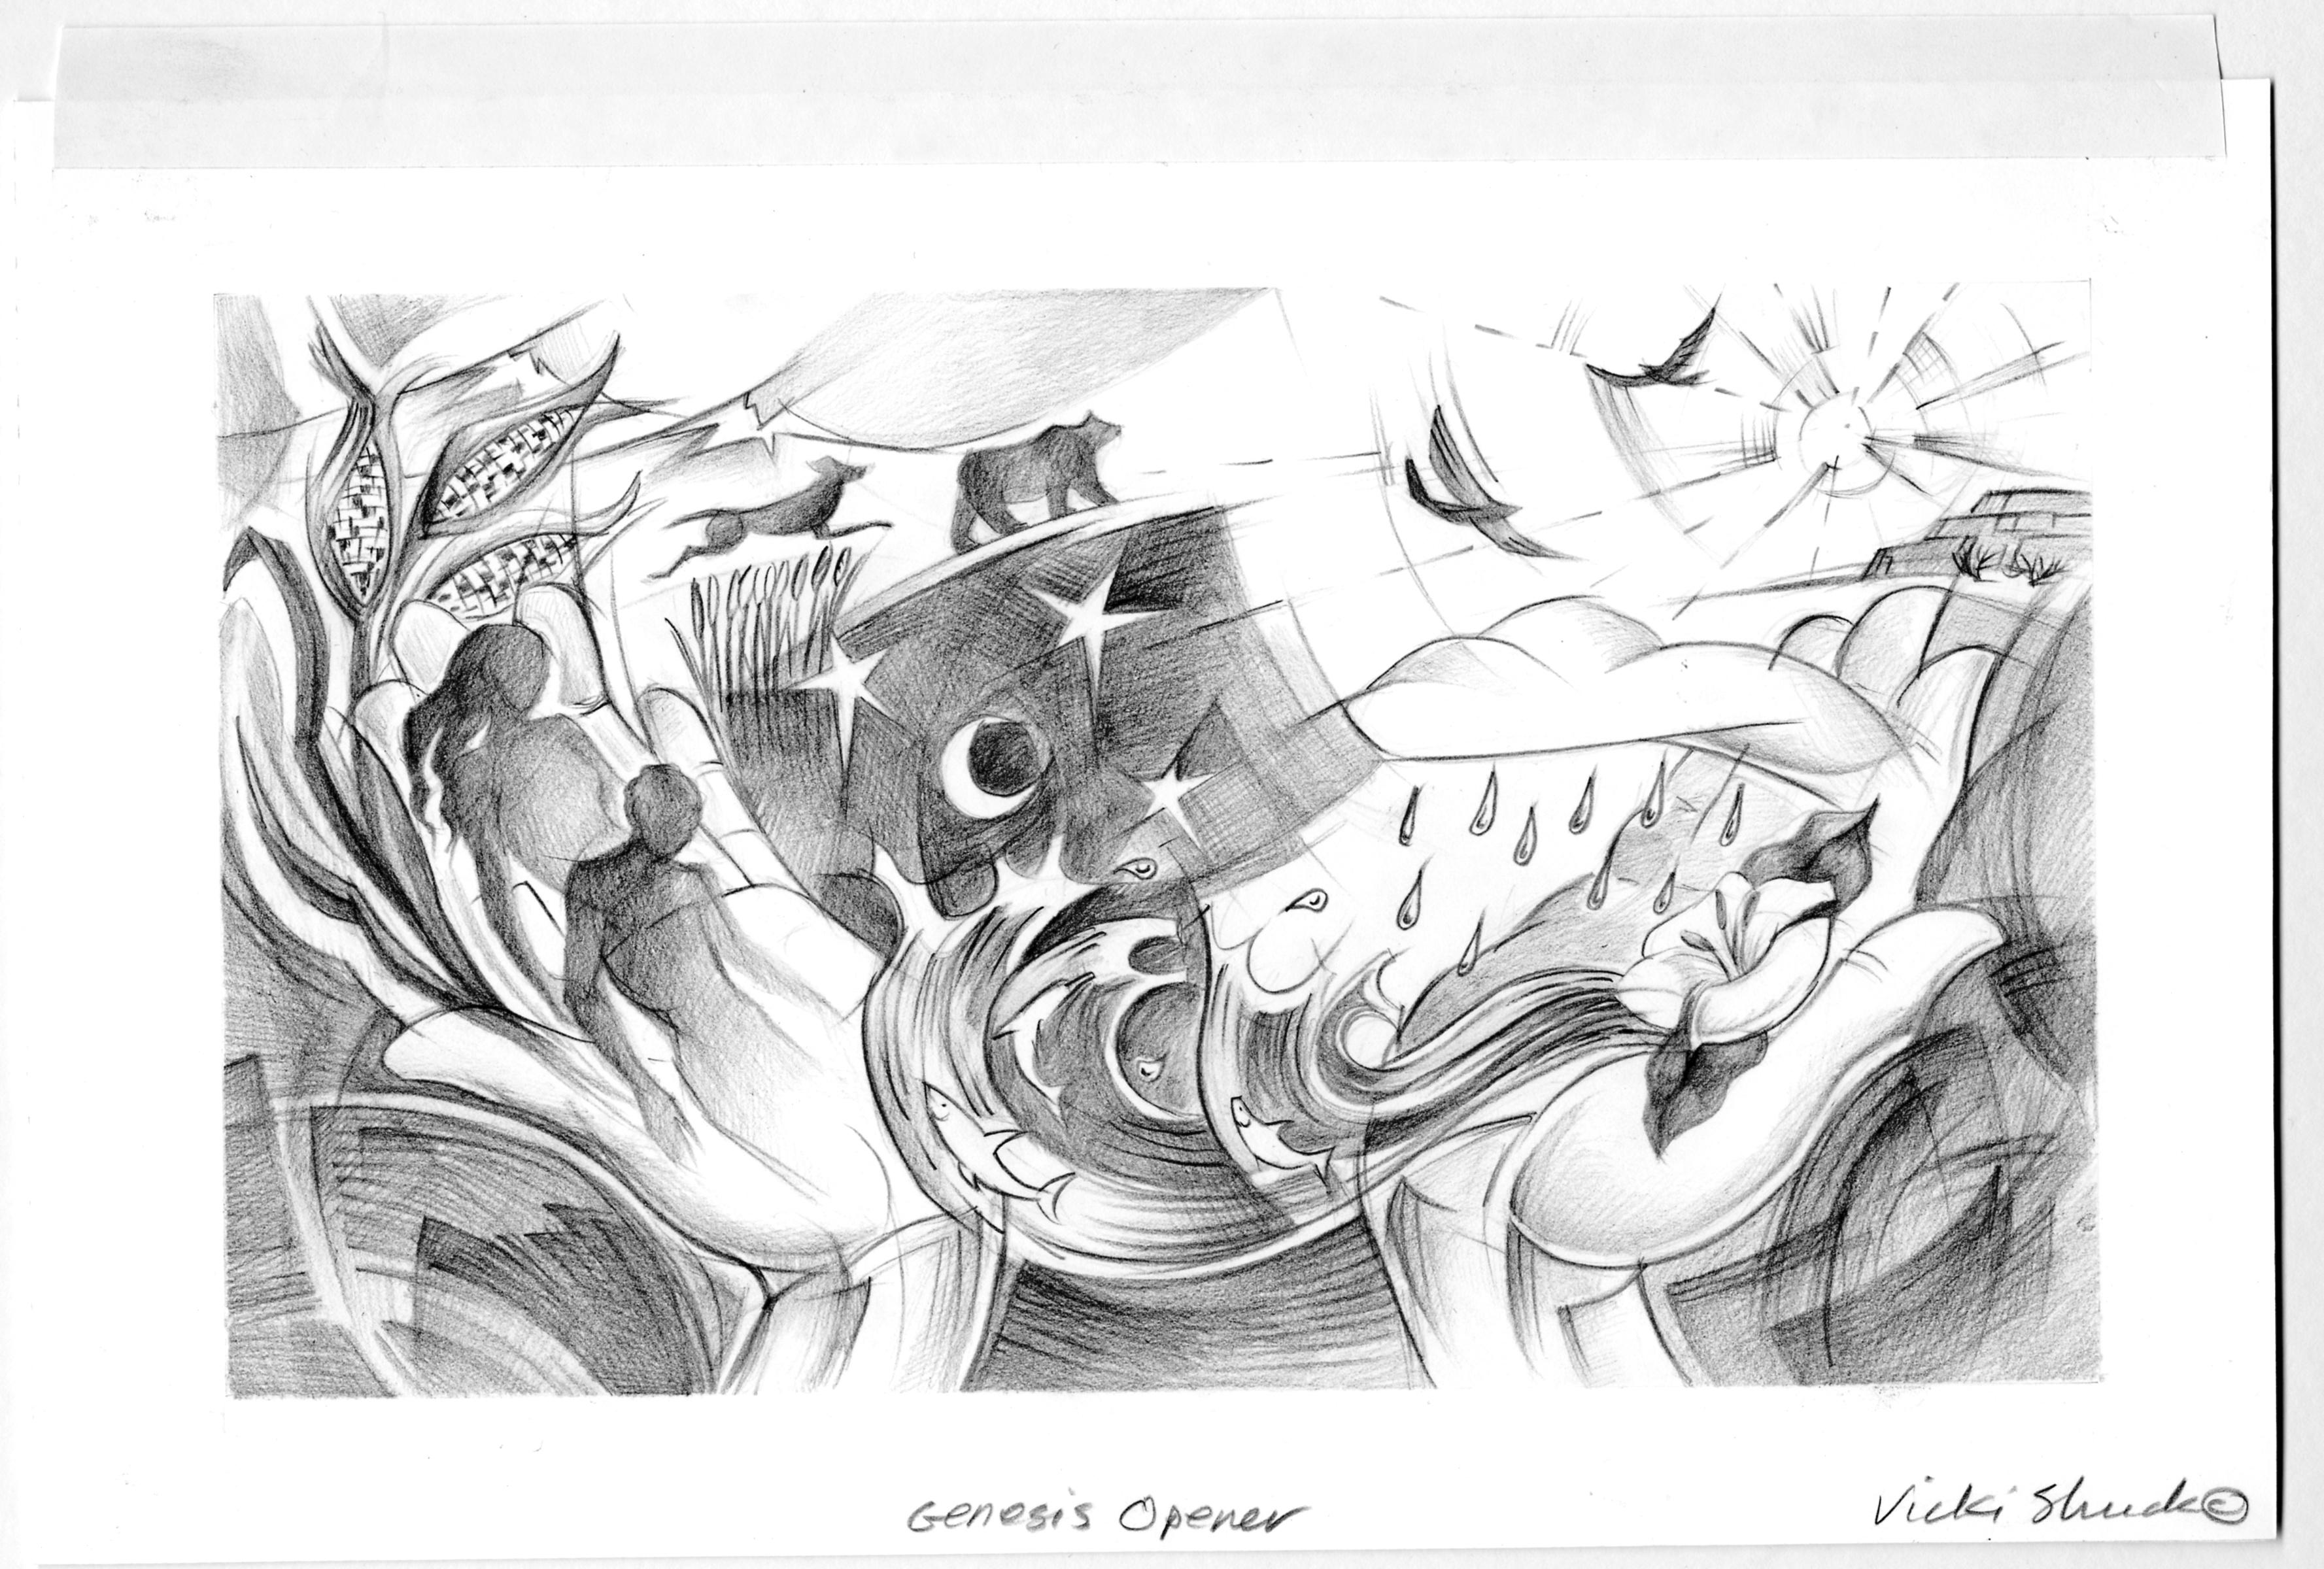 Genesis 2 4 23 Illustration